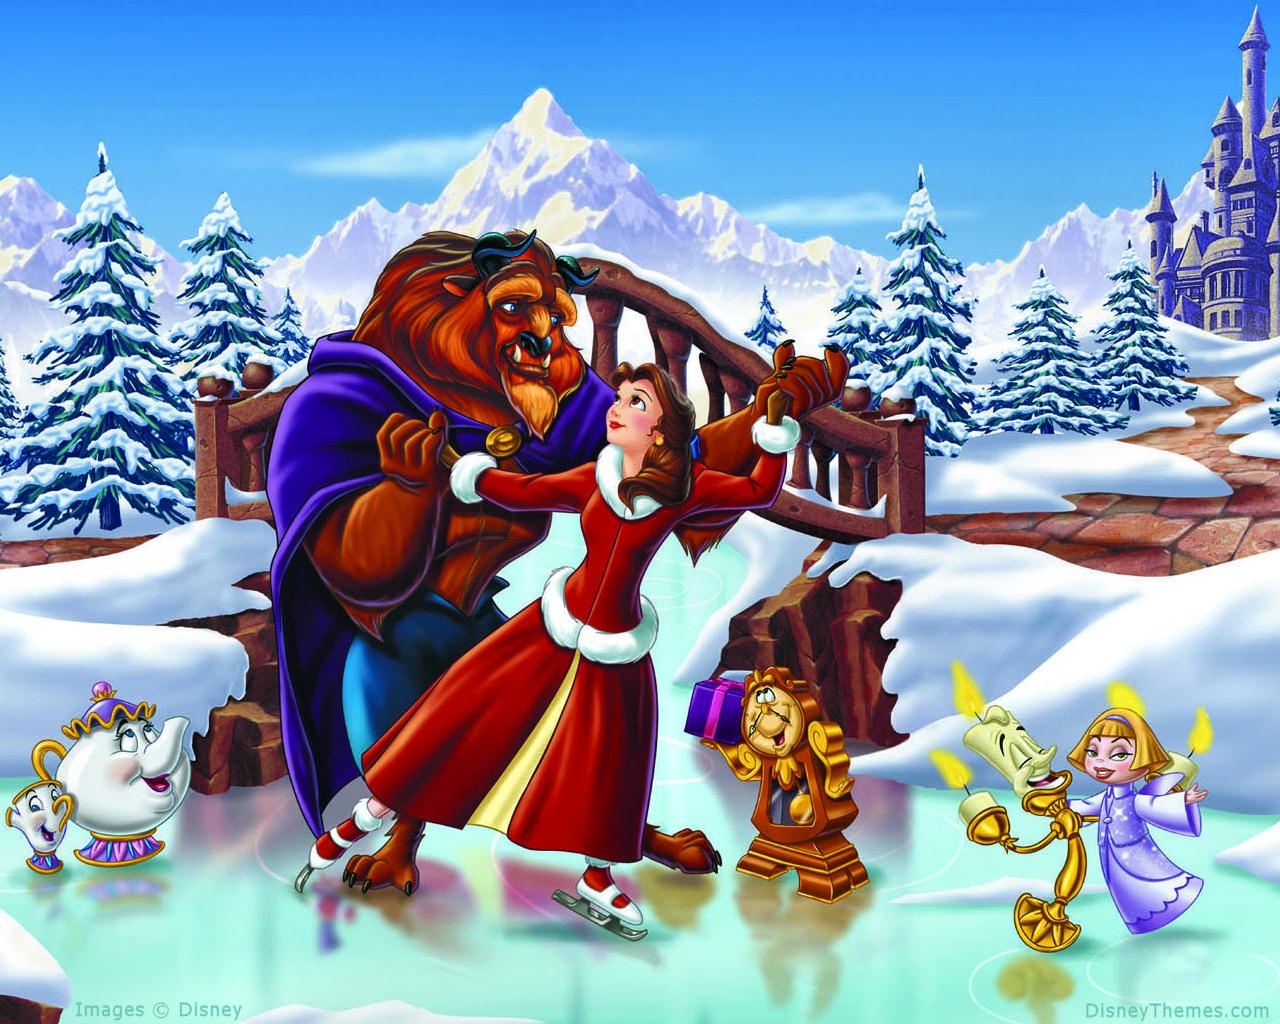 Disney Christmas WallpaperTHR999HKRG 1 1280x1024